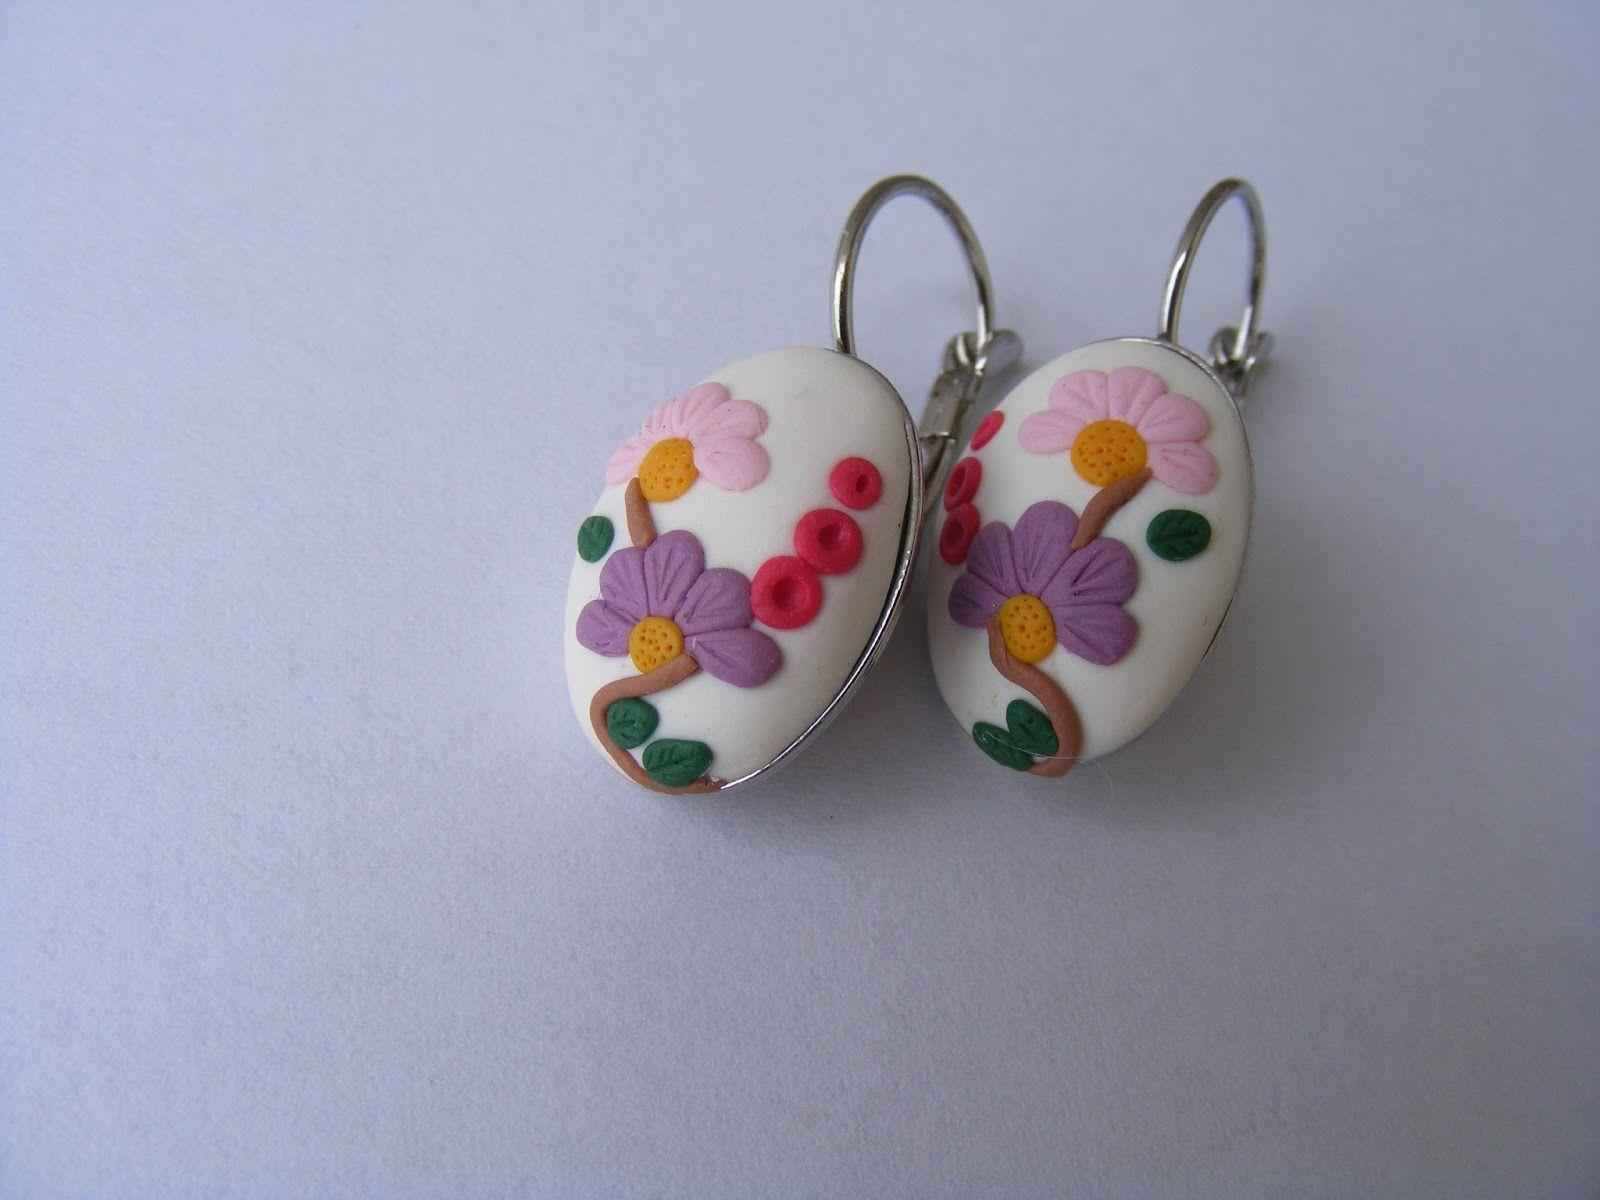 http://lorelai-beads.blogspot.com/